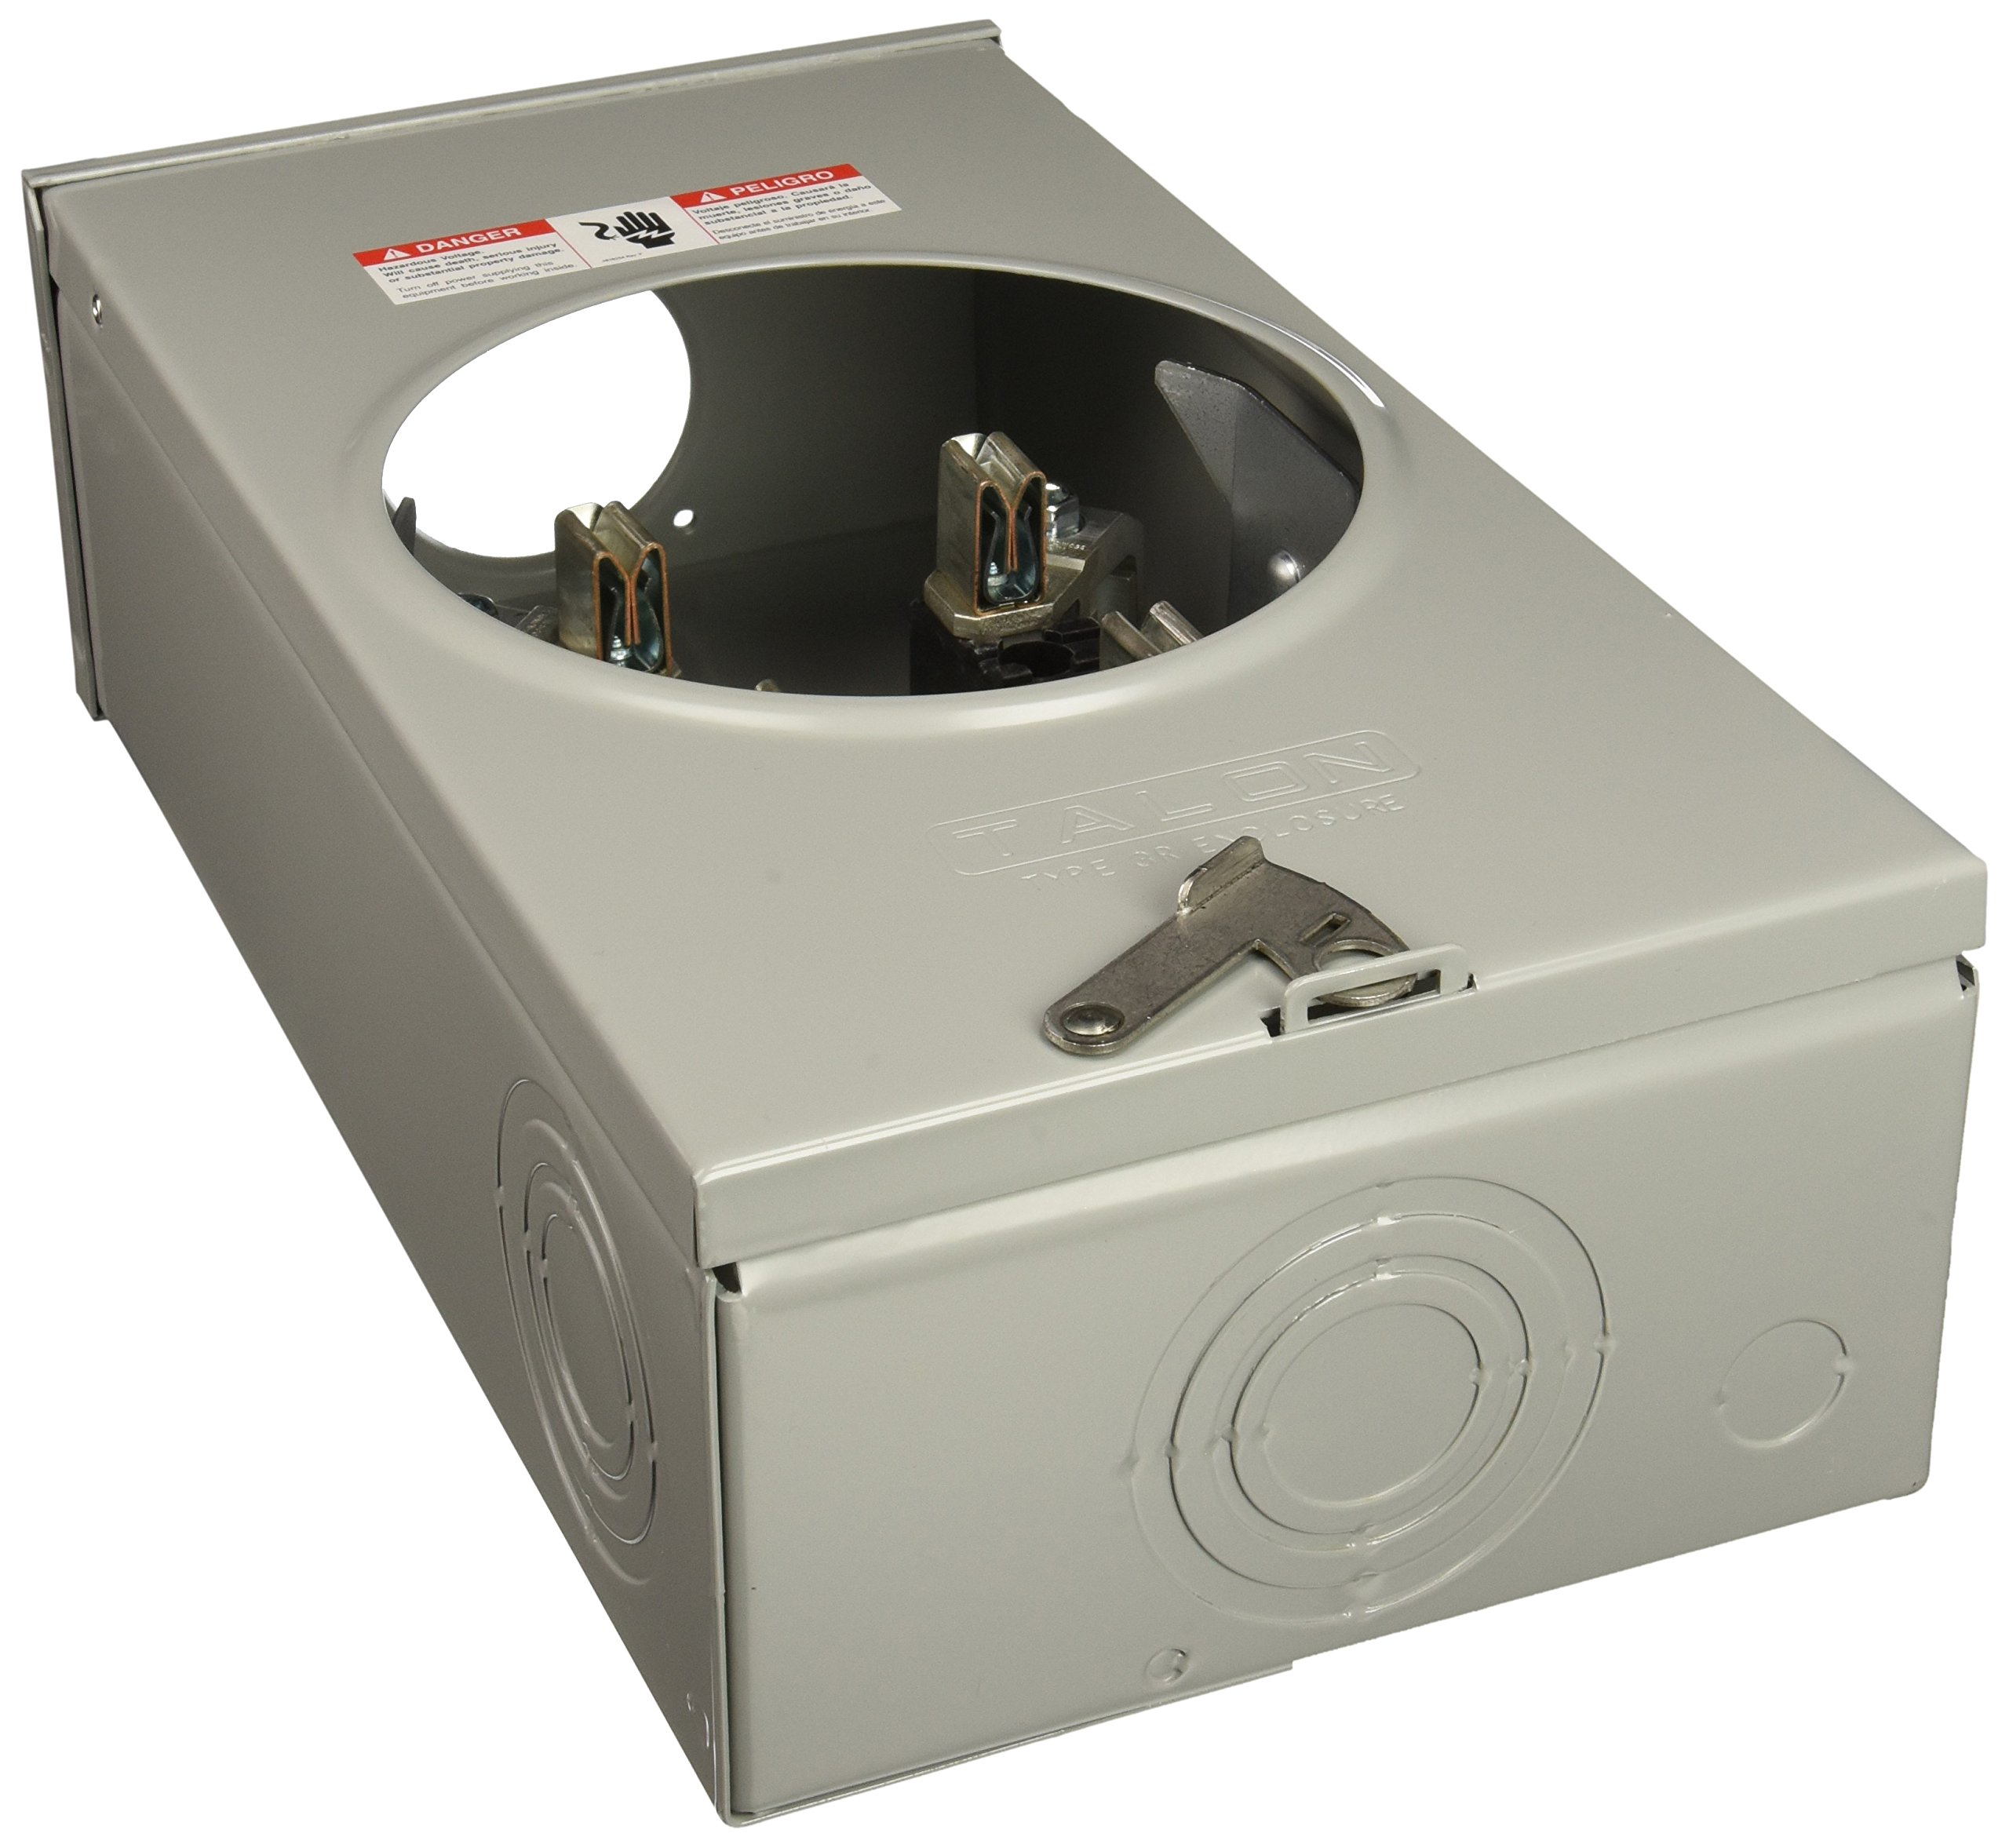 Siemens SUAT317-0G 200-Amp, 4 Jaw, Ringless Cover, Overhead Feed, Meter Socket